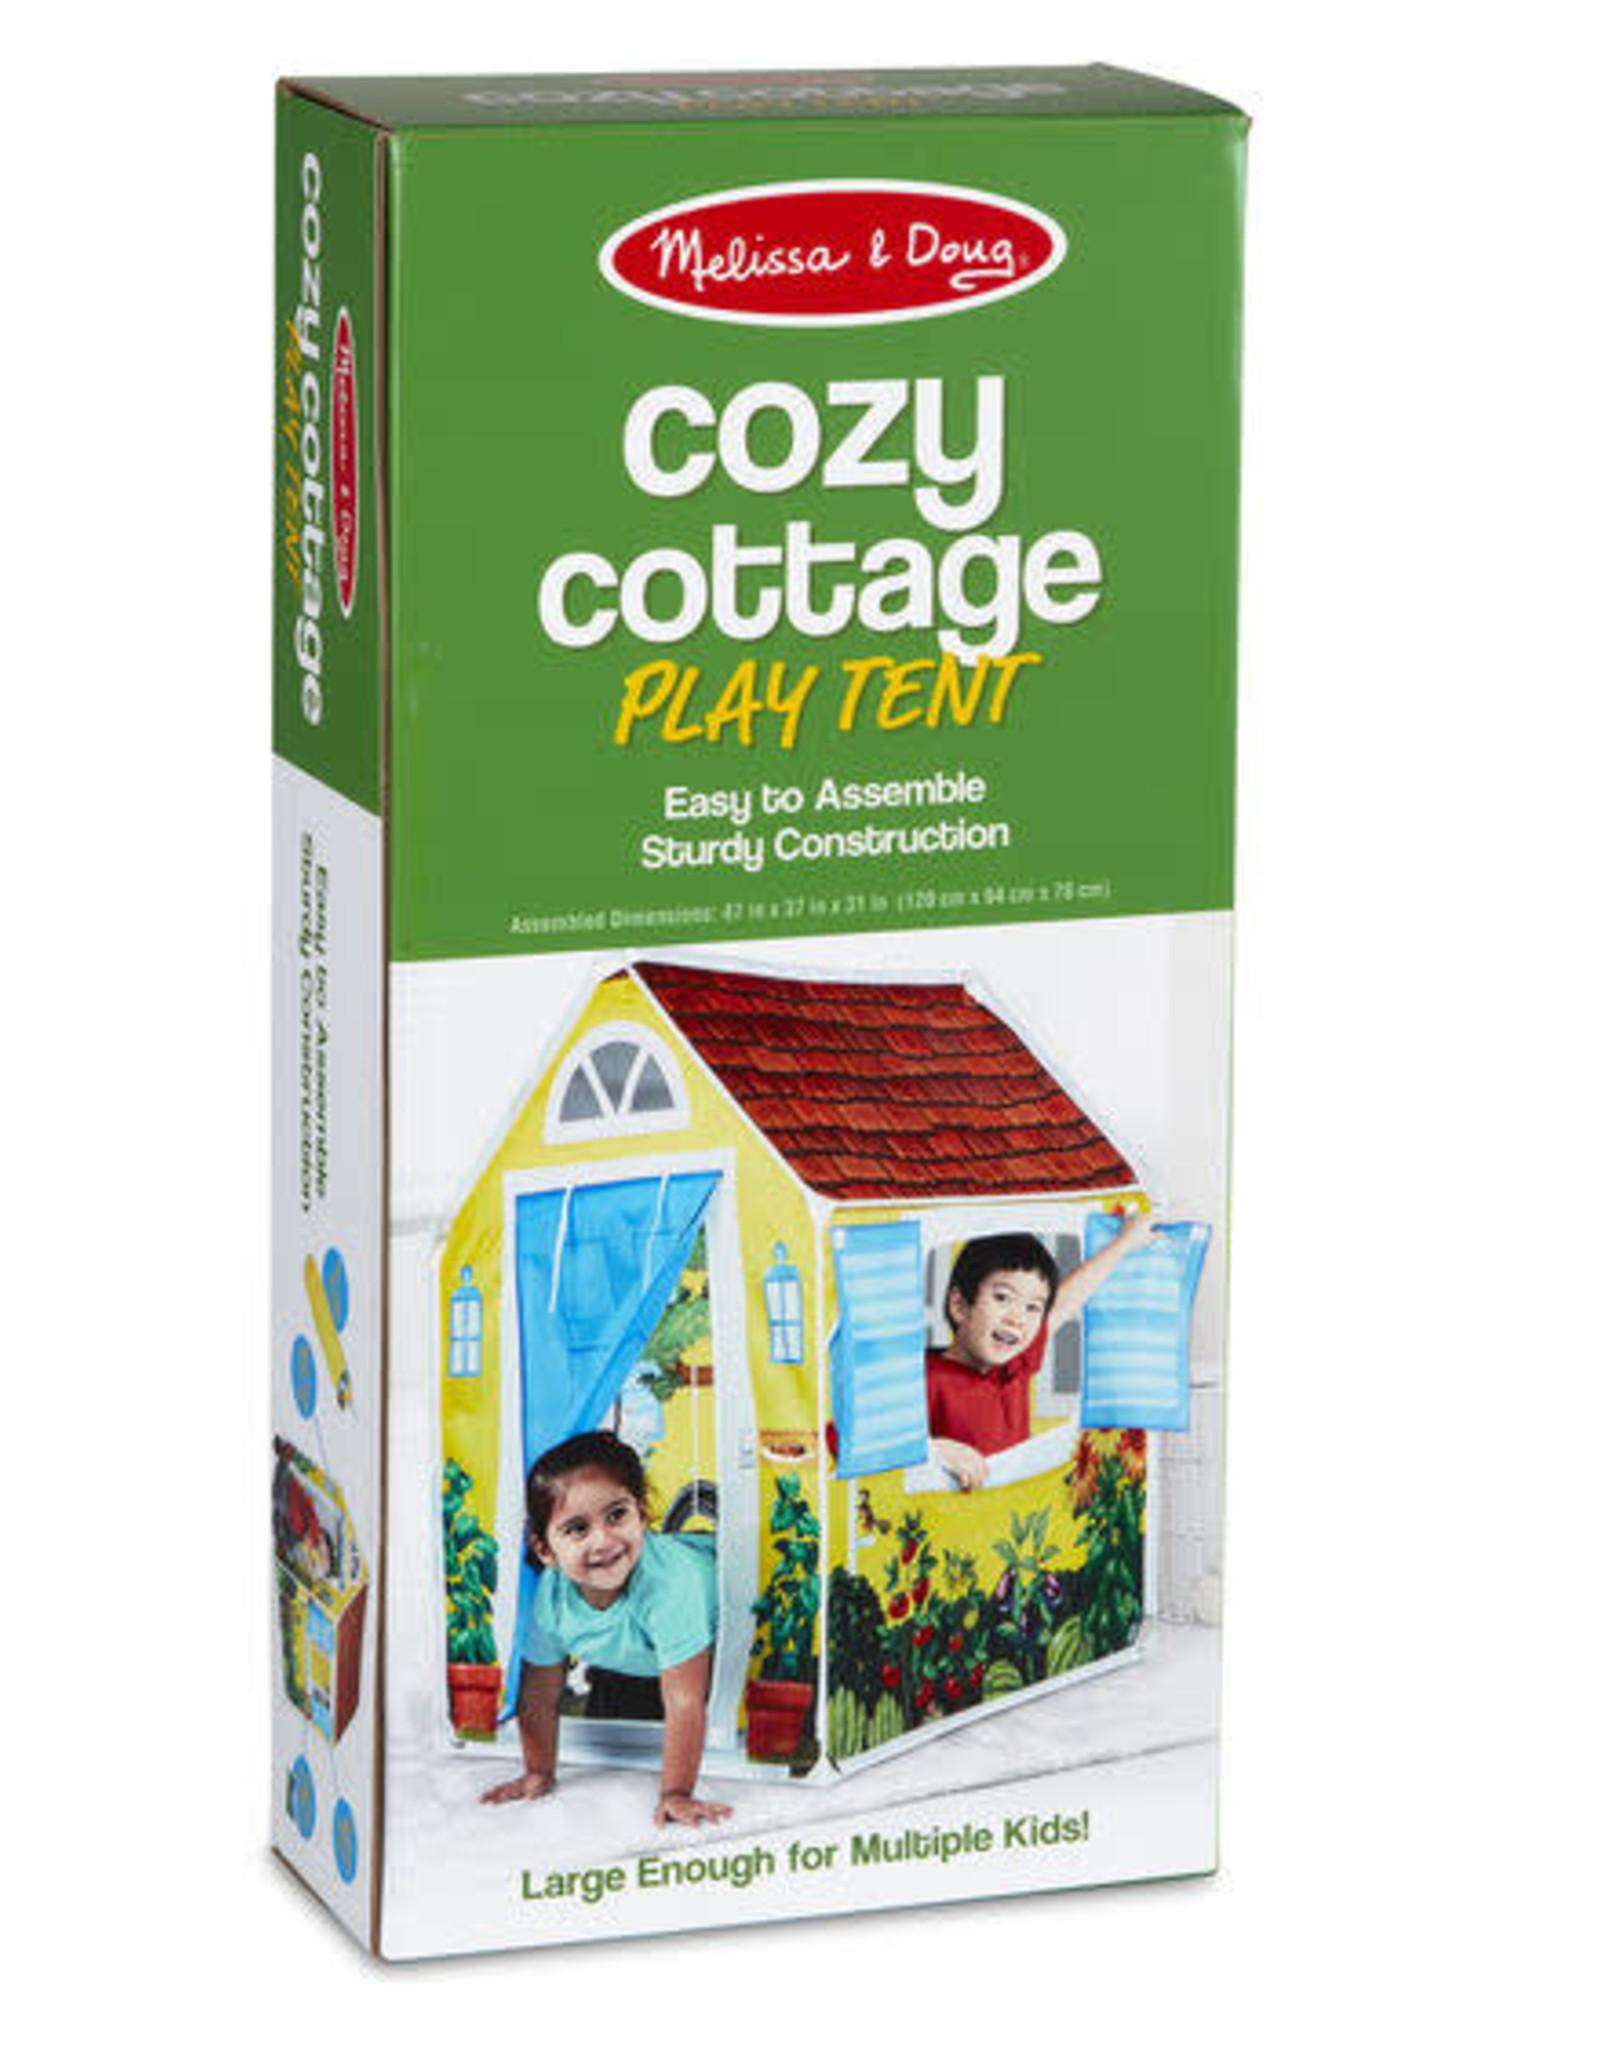 Melissa & Doug Cozy Cottage Tent